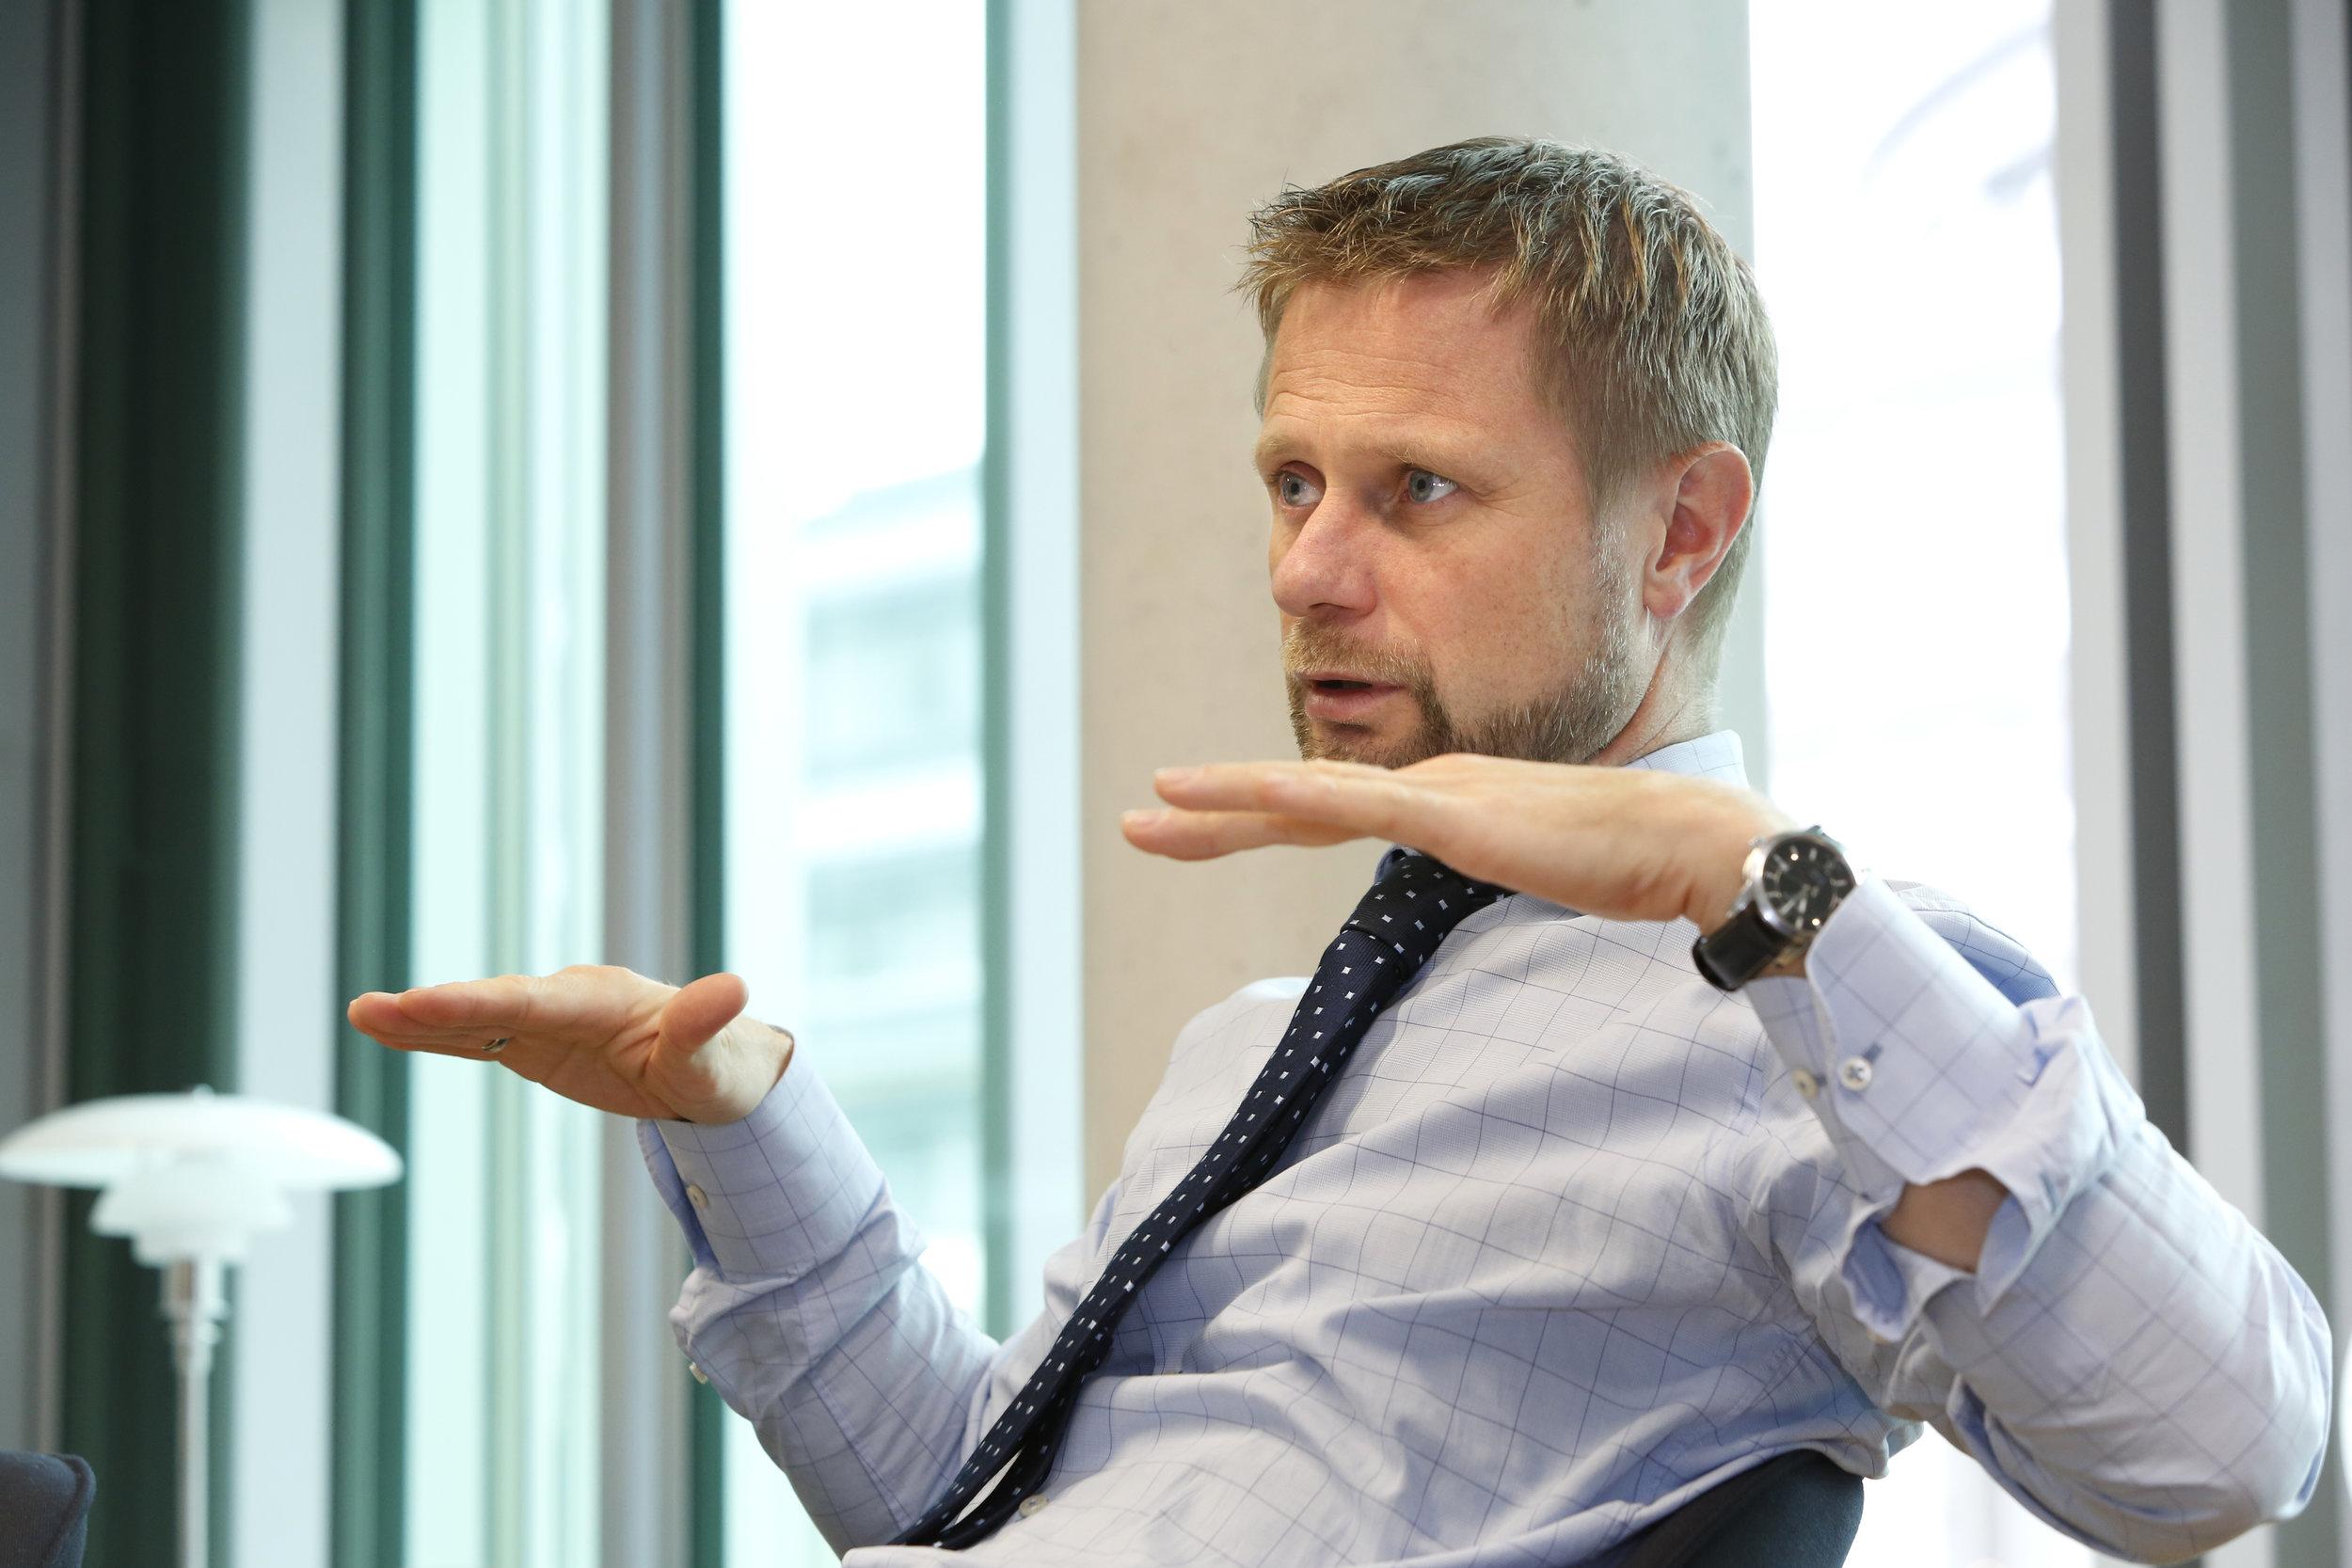 Det er Helse- og omsorgsdepartementet som har lagt fram forslaget om kutt. Her ved helseminister Bent Høie (H).FOTO: NordForsk/Terje Heiestad.